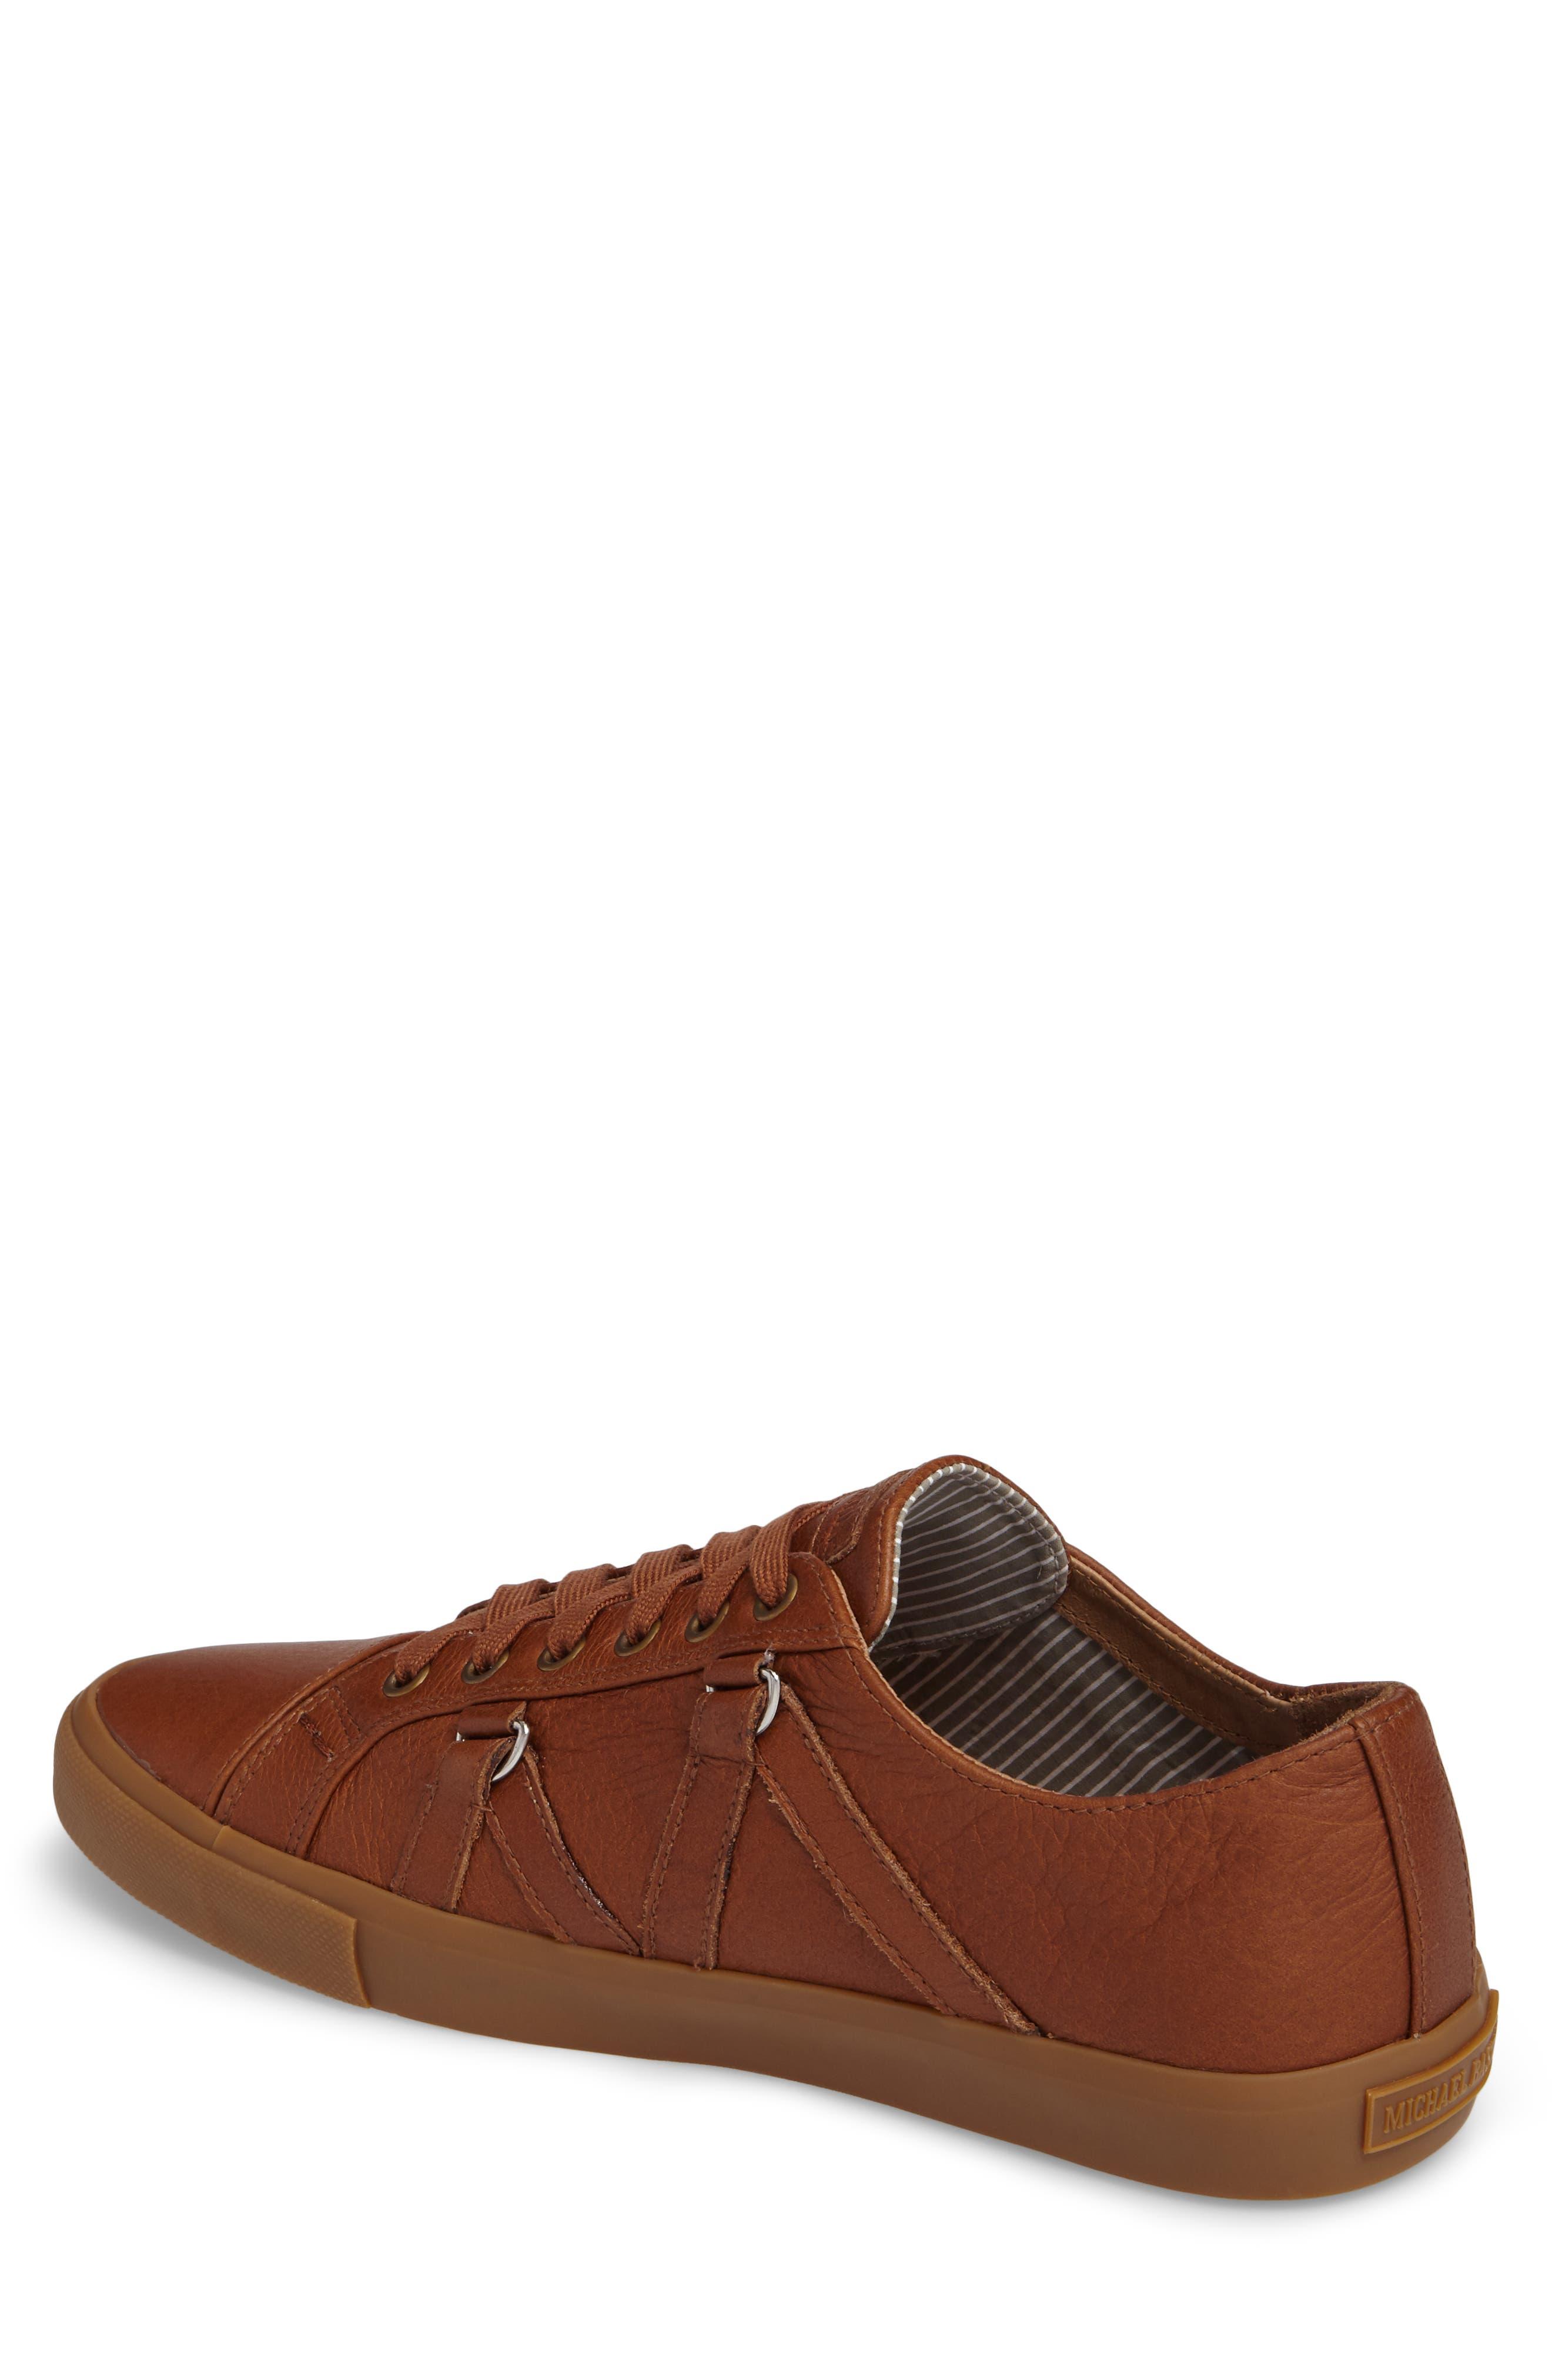 Alternate Image 2  - Michael Bastian Signature Sneaker (Men)